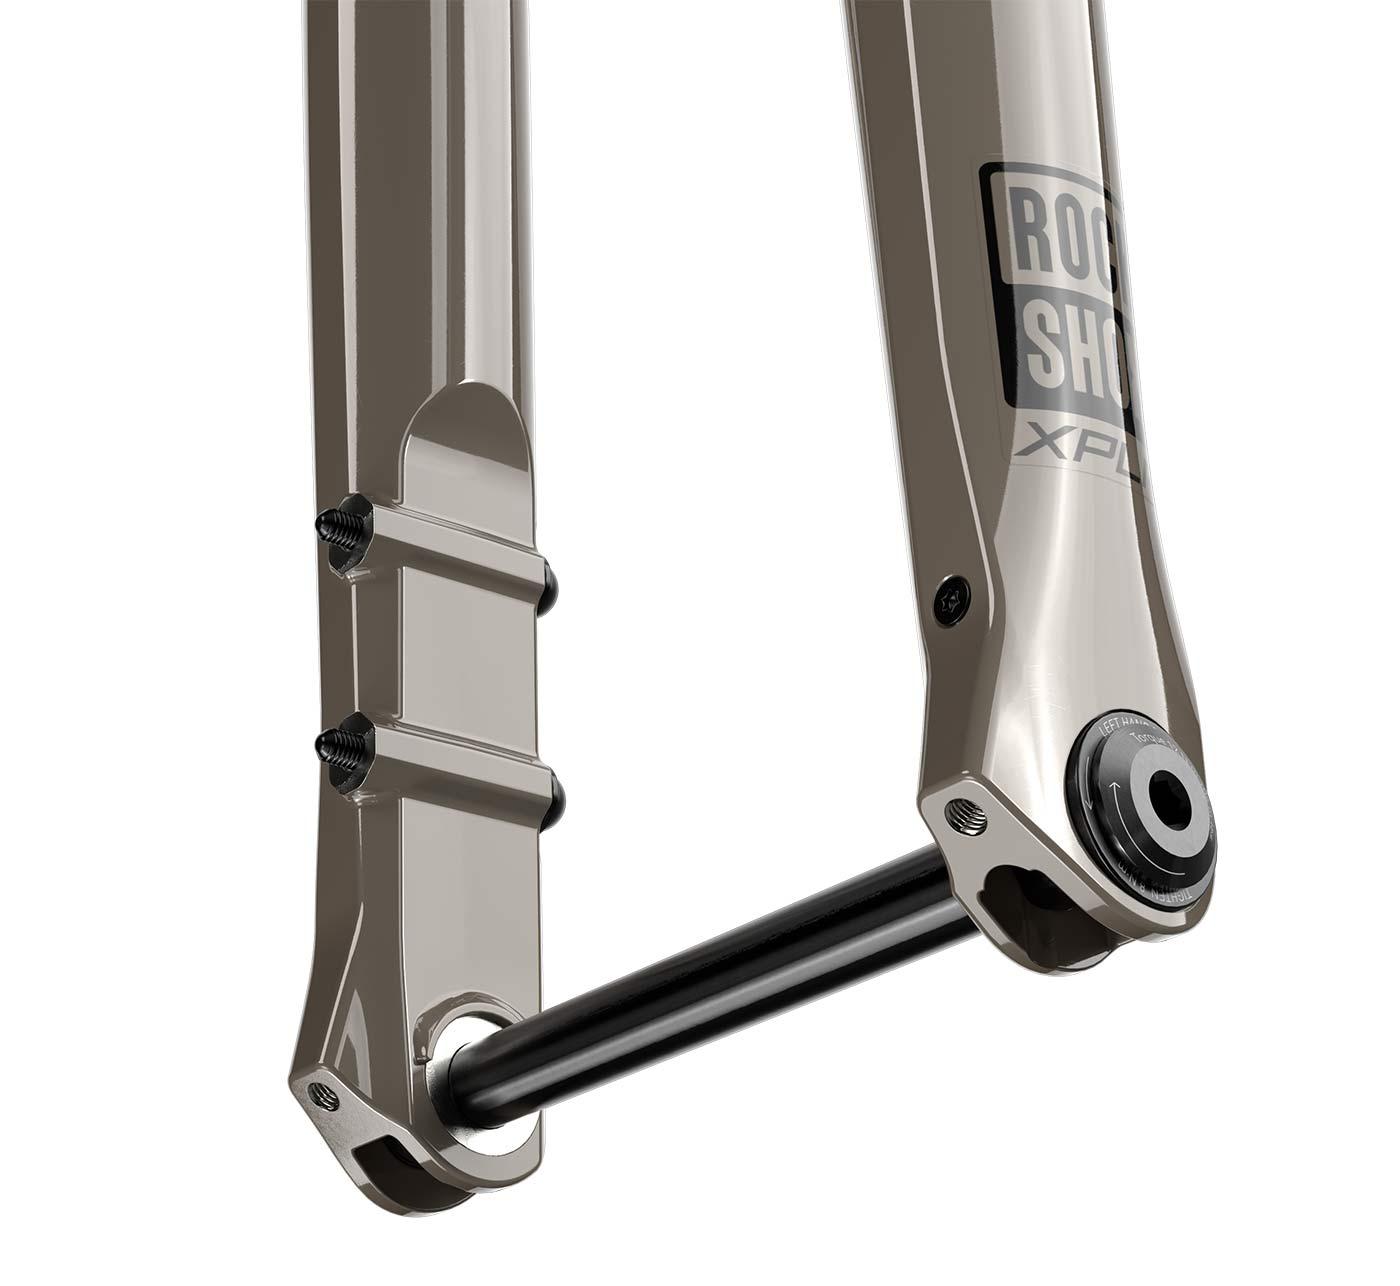 closeup details of the 2022 rockshox rudy gravel bike suspension fork